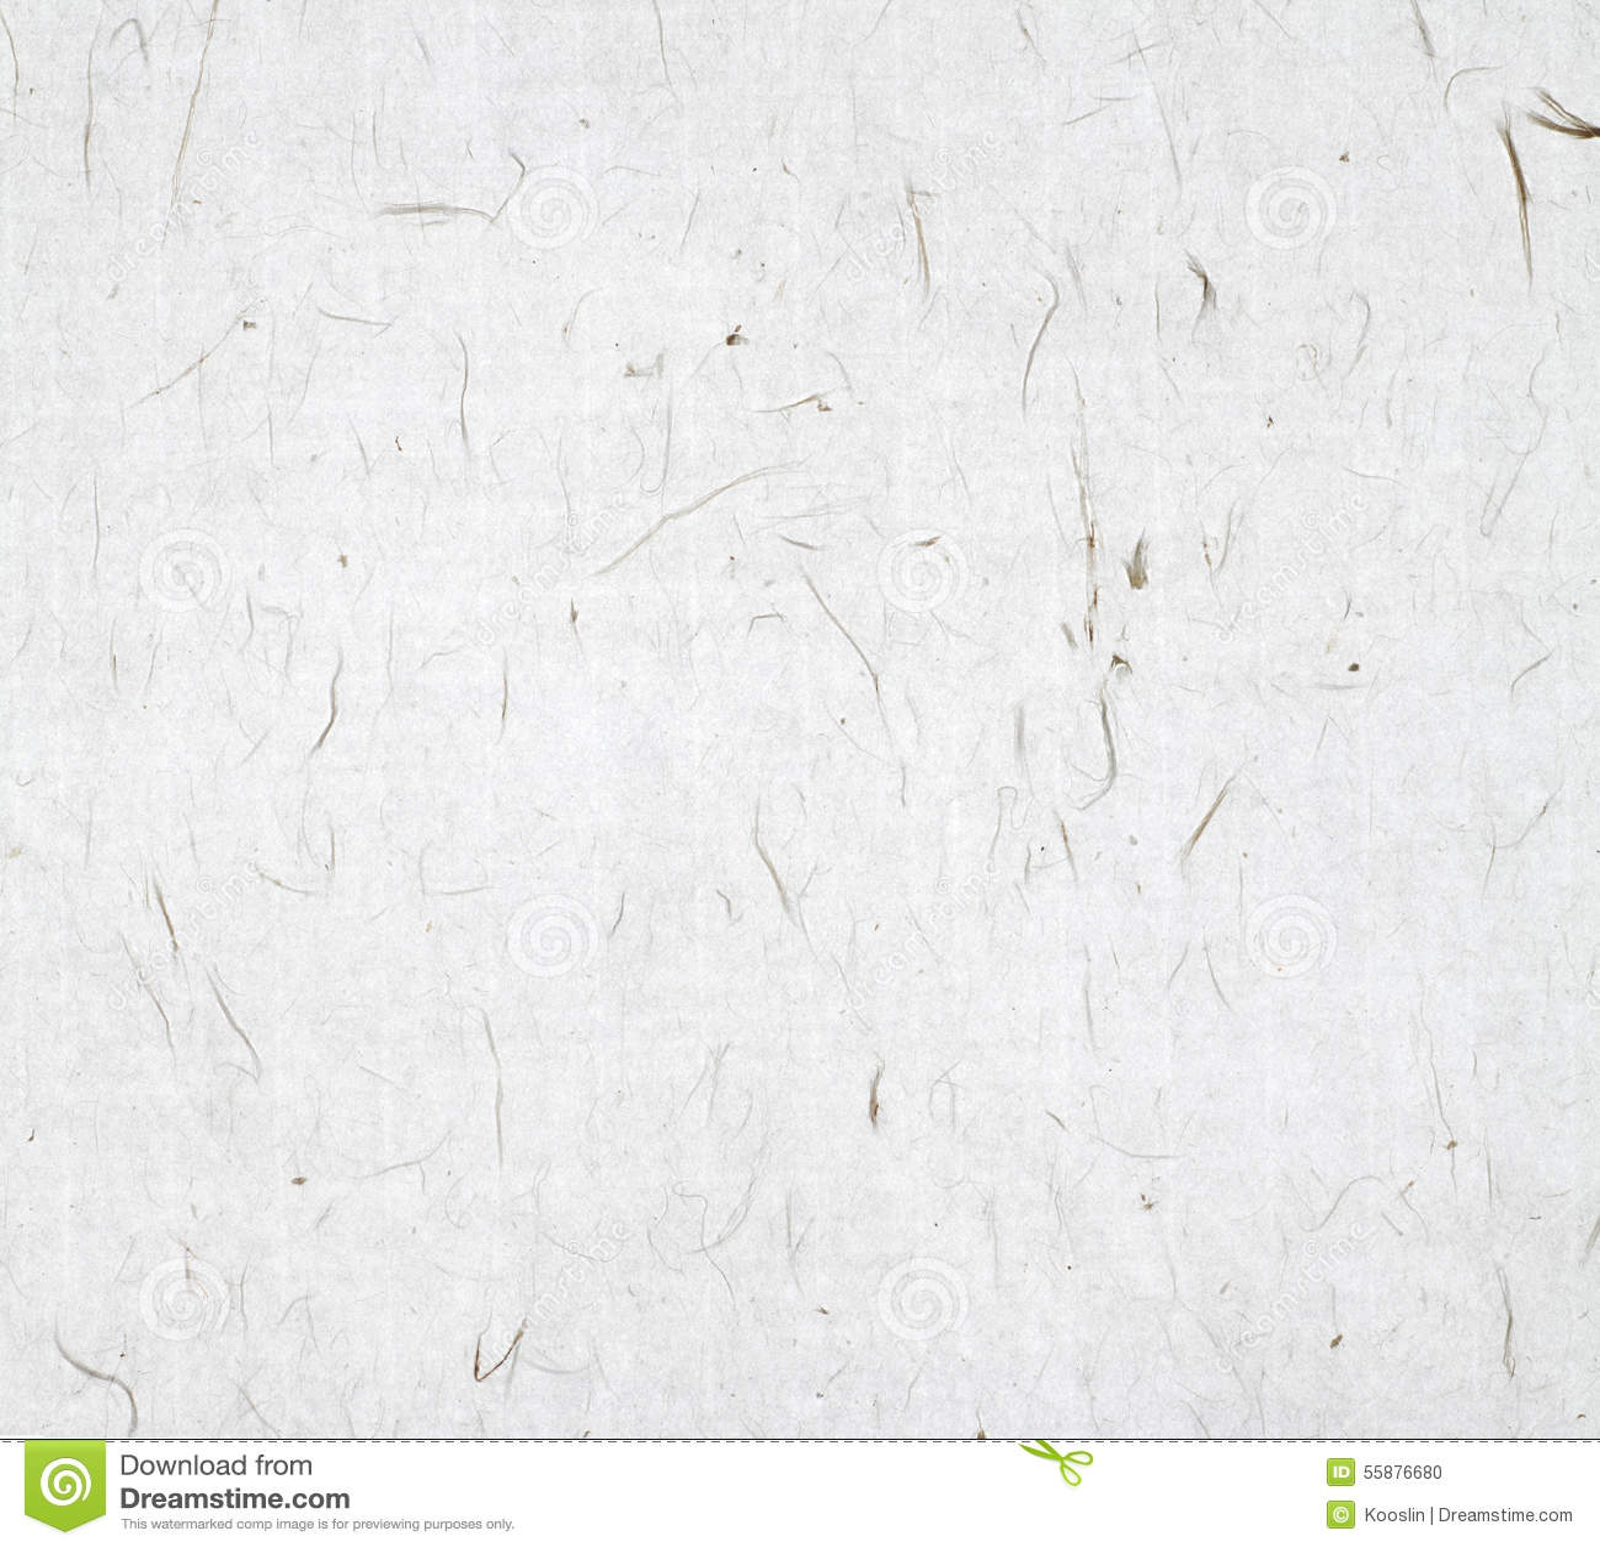 Custom made term paper wallpaper